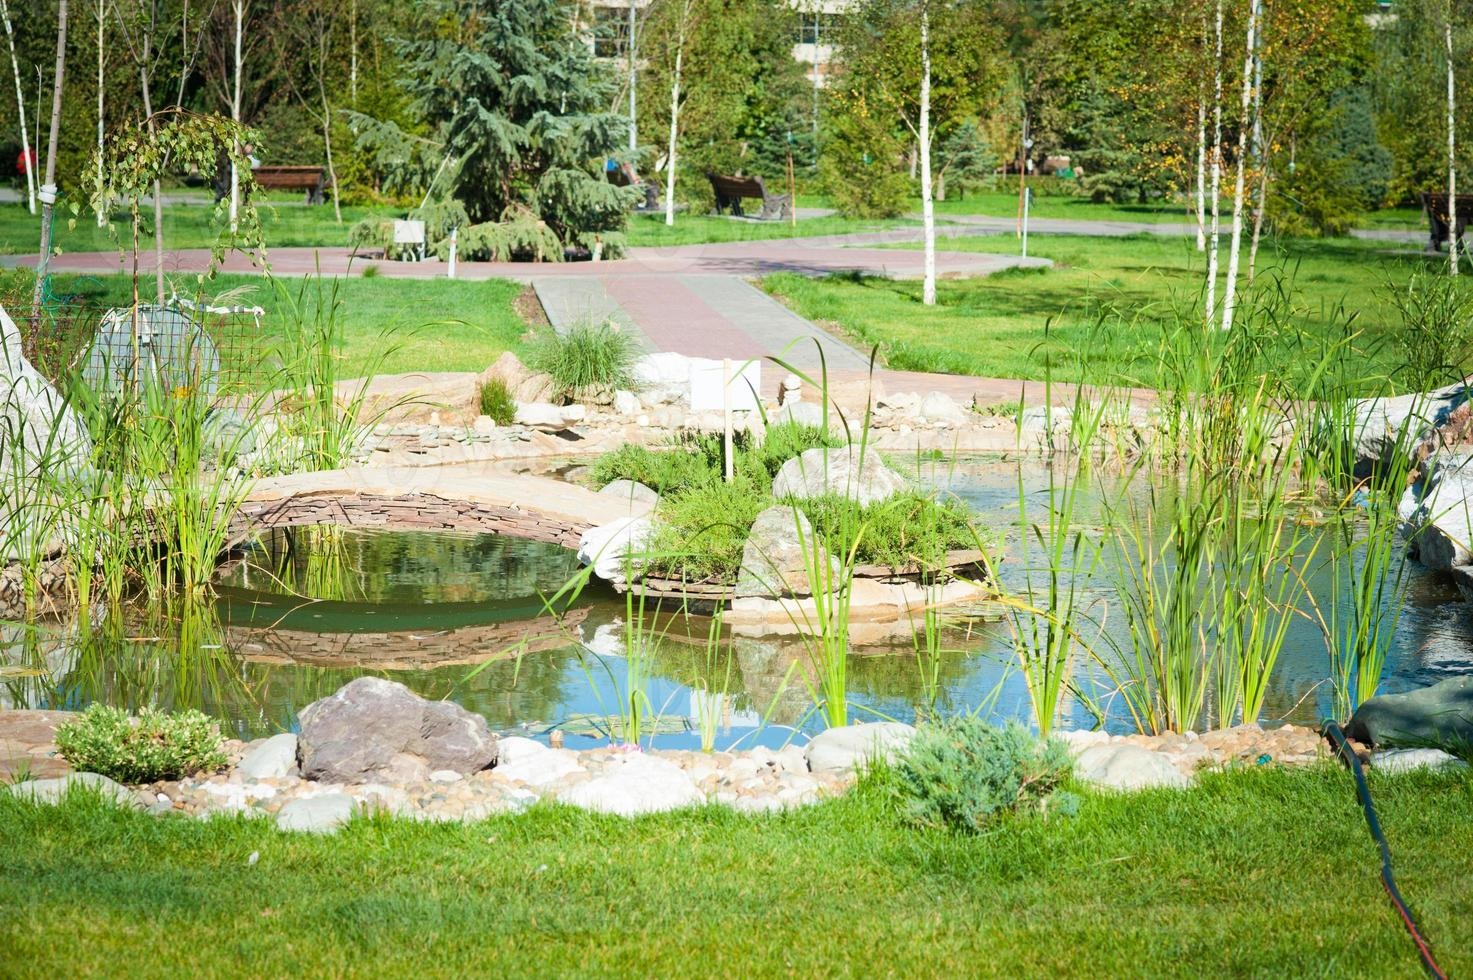 lilla damm i parken foto